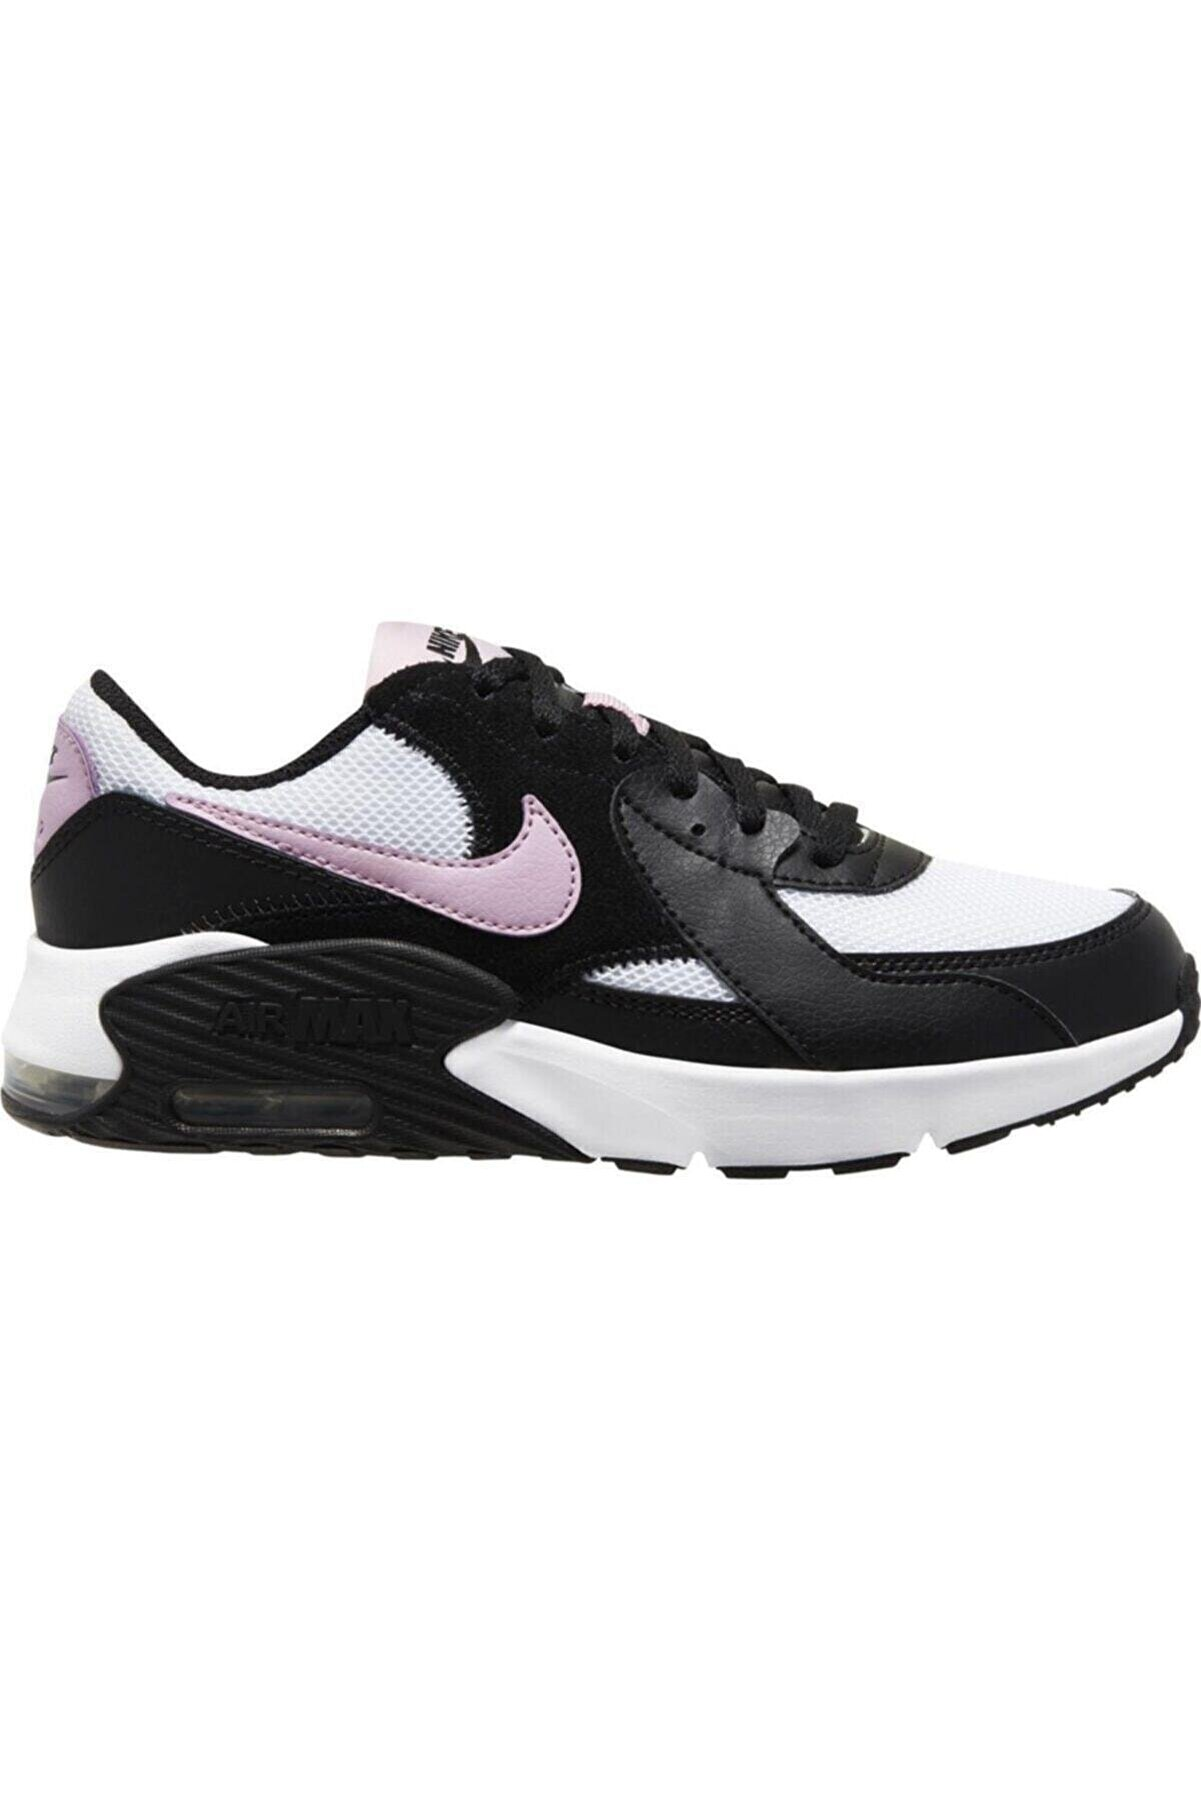 Nike Kadın Spor Ayakkabı Air Max Excee Cd6894-004 Cd6894-004